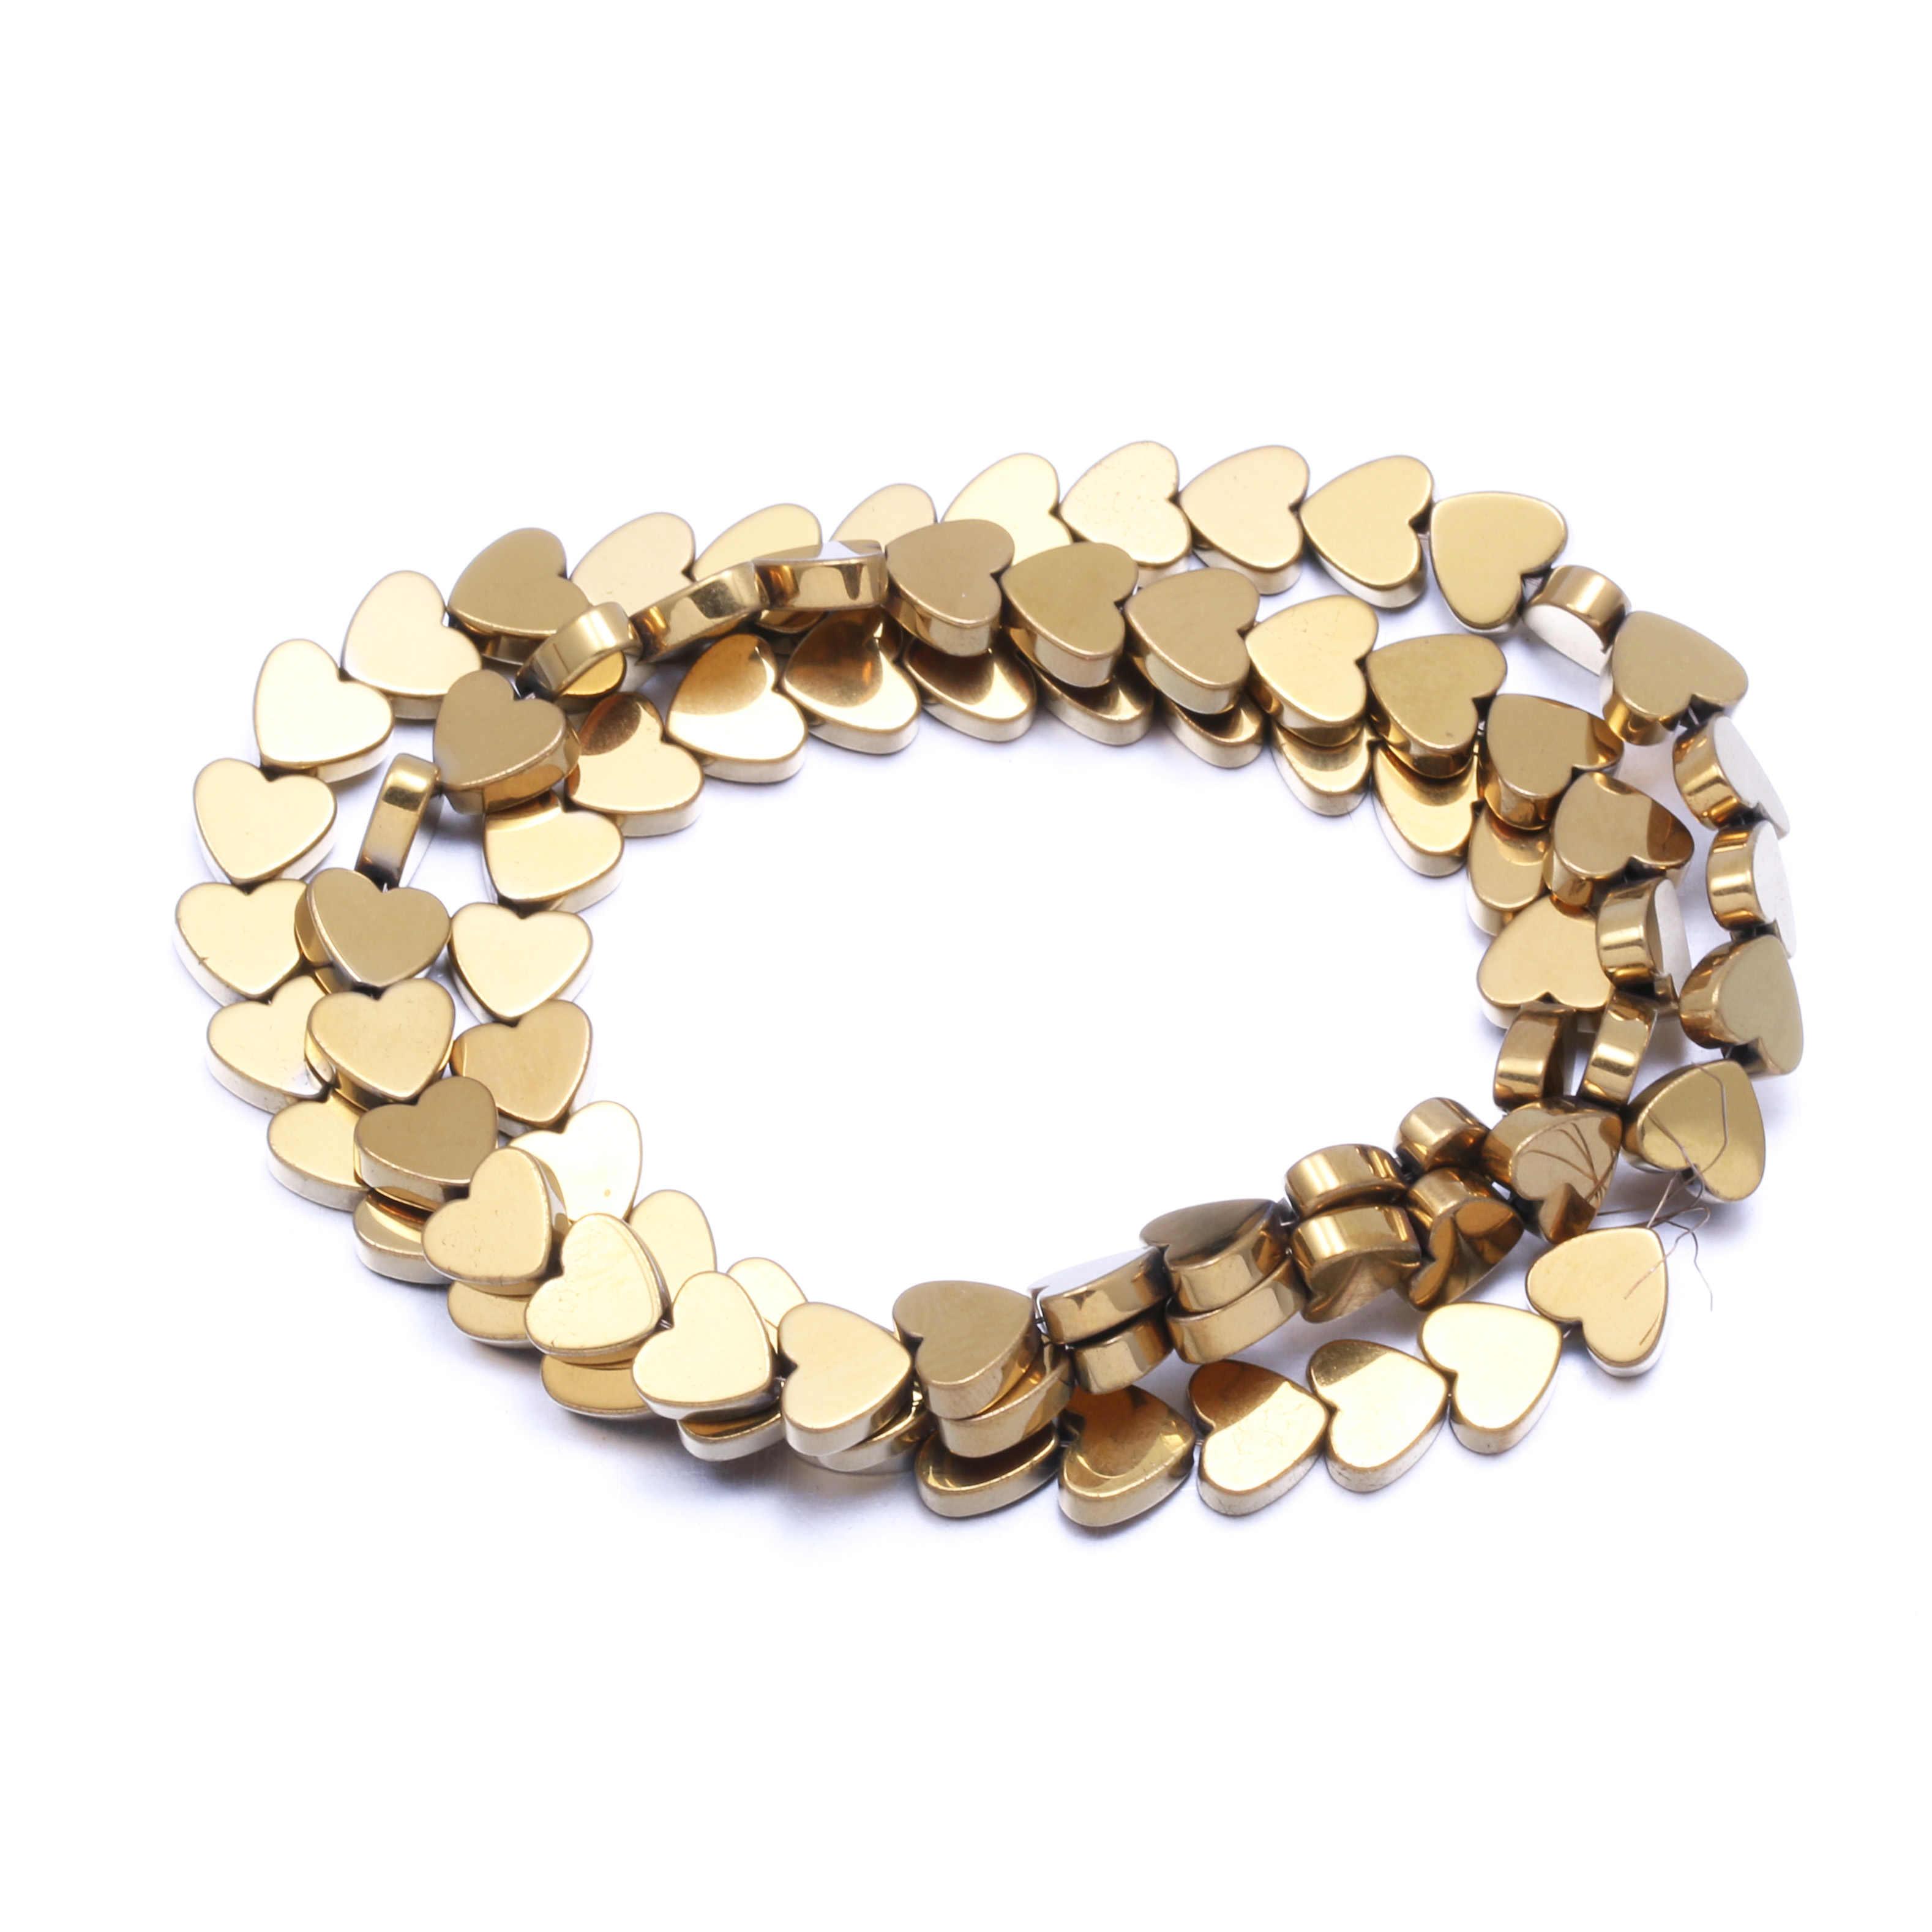 3 meters Retro Bronze 4x4mm Round Link Chain Handmade DIY Jewelry Accessories